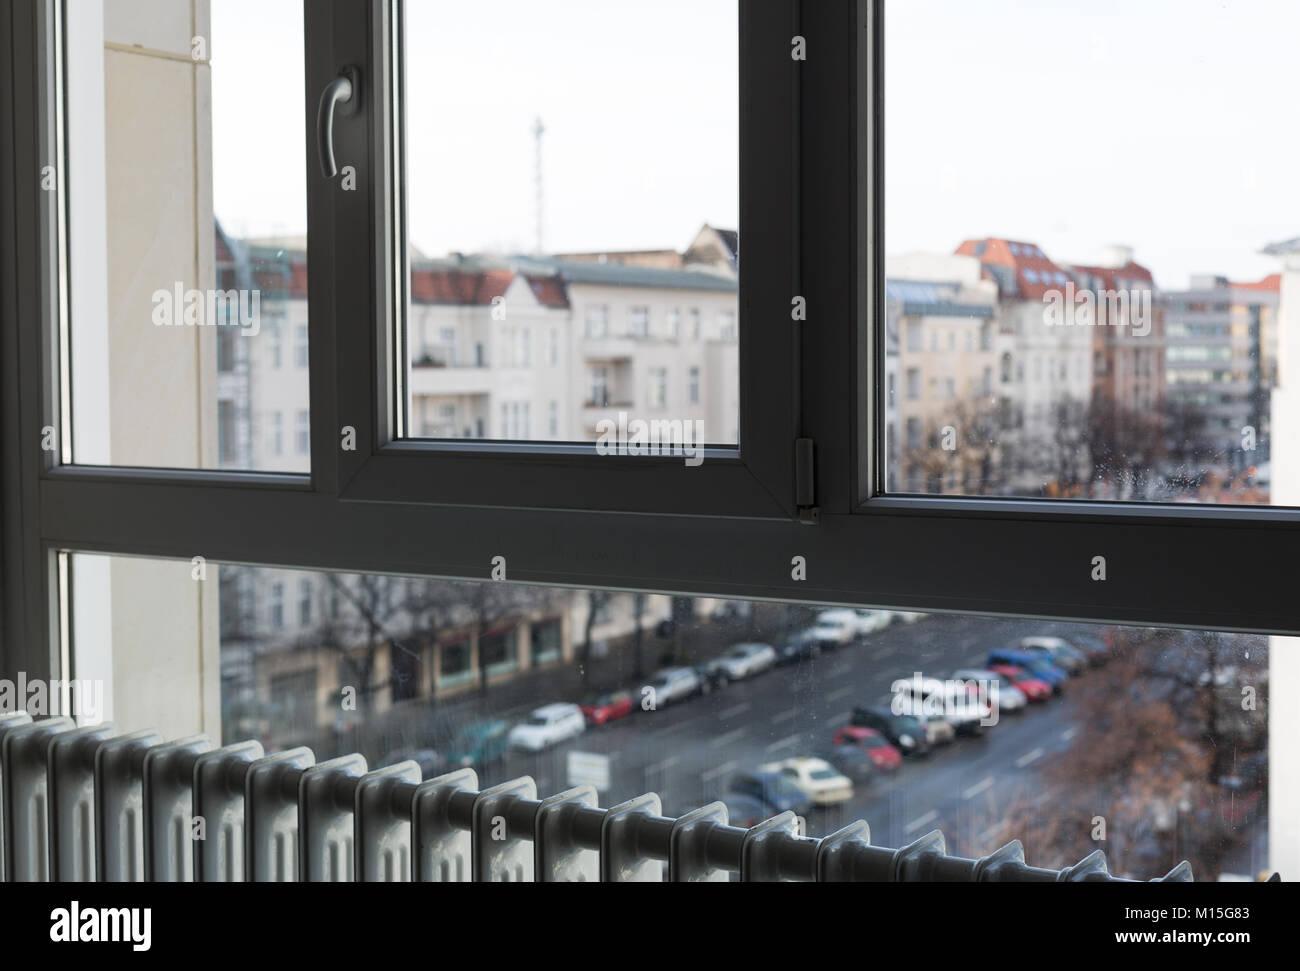 Heating Radiator Under Window Stock Photo Alamy